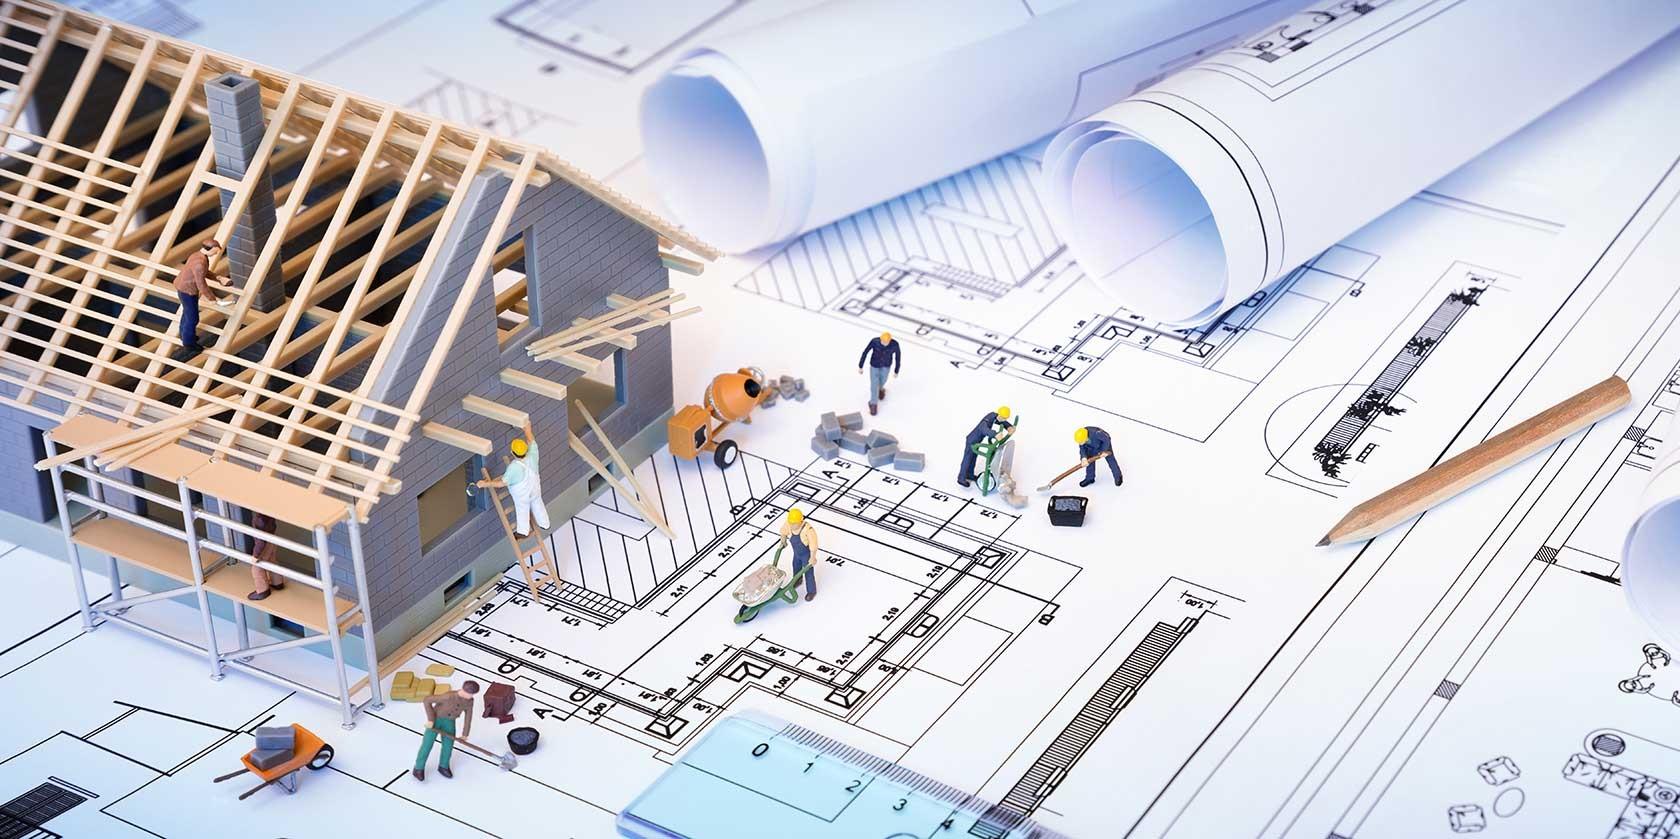 Architects-Property-Developer-construction-services-johannesburg-black-owned-company-1-Ramesu-Group-Ramesu-Architects-1